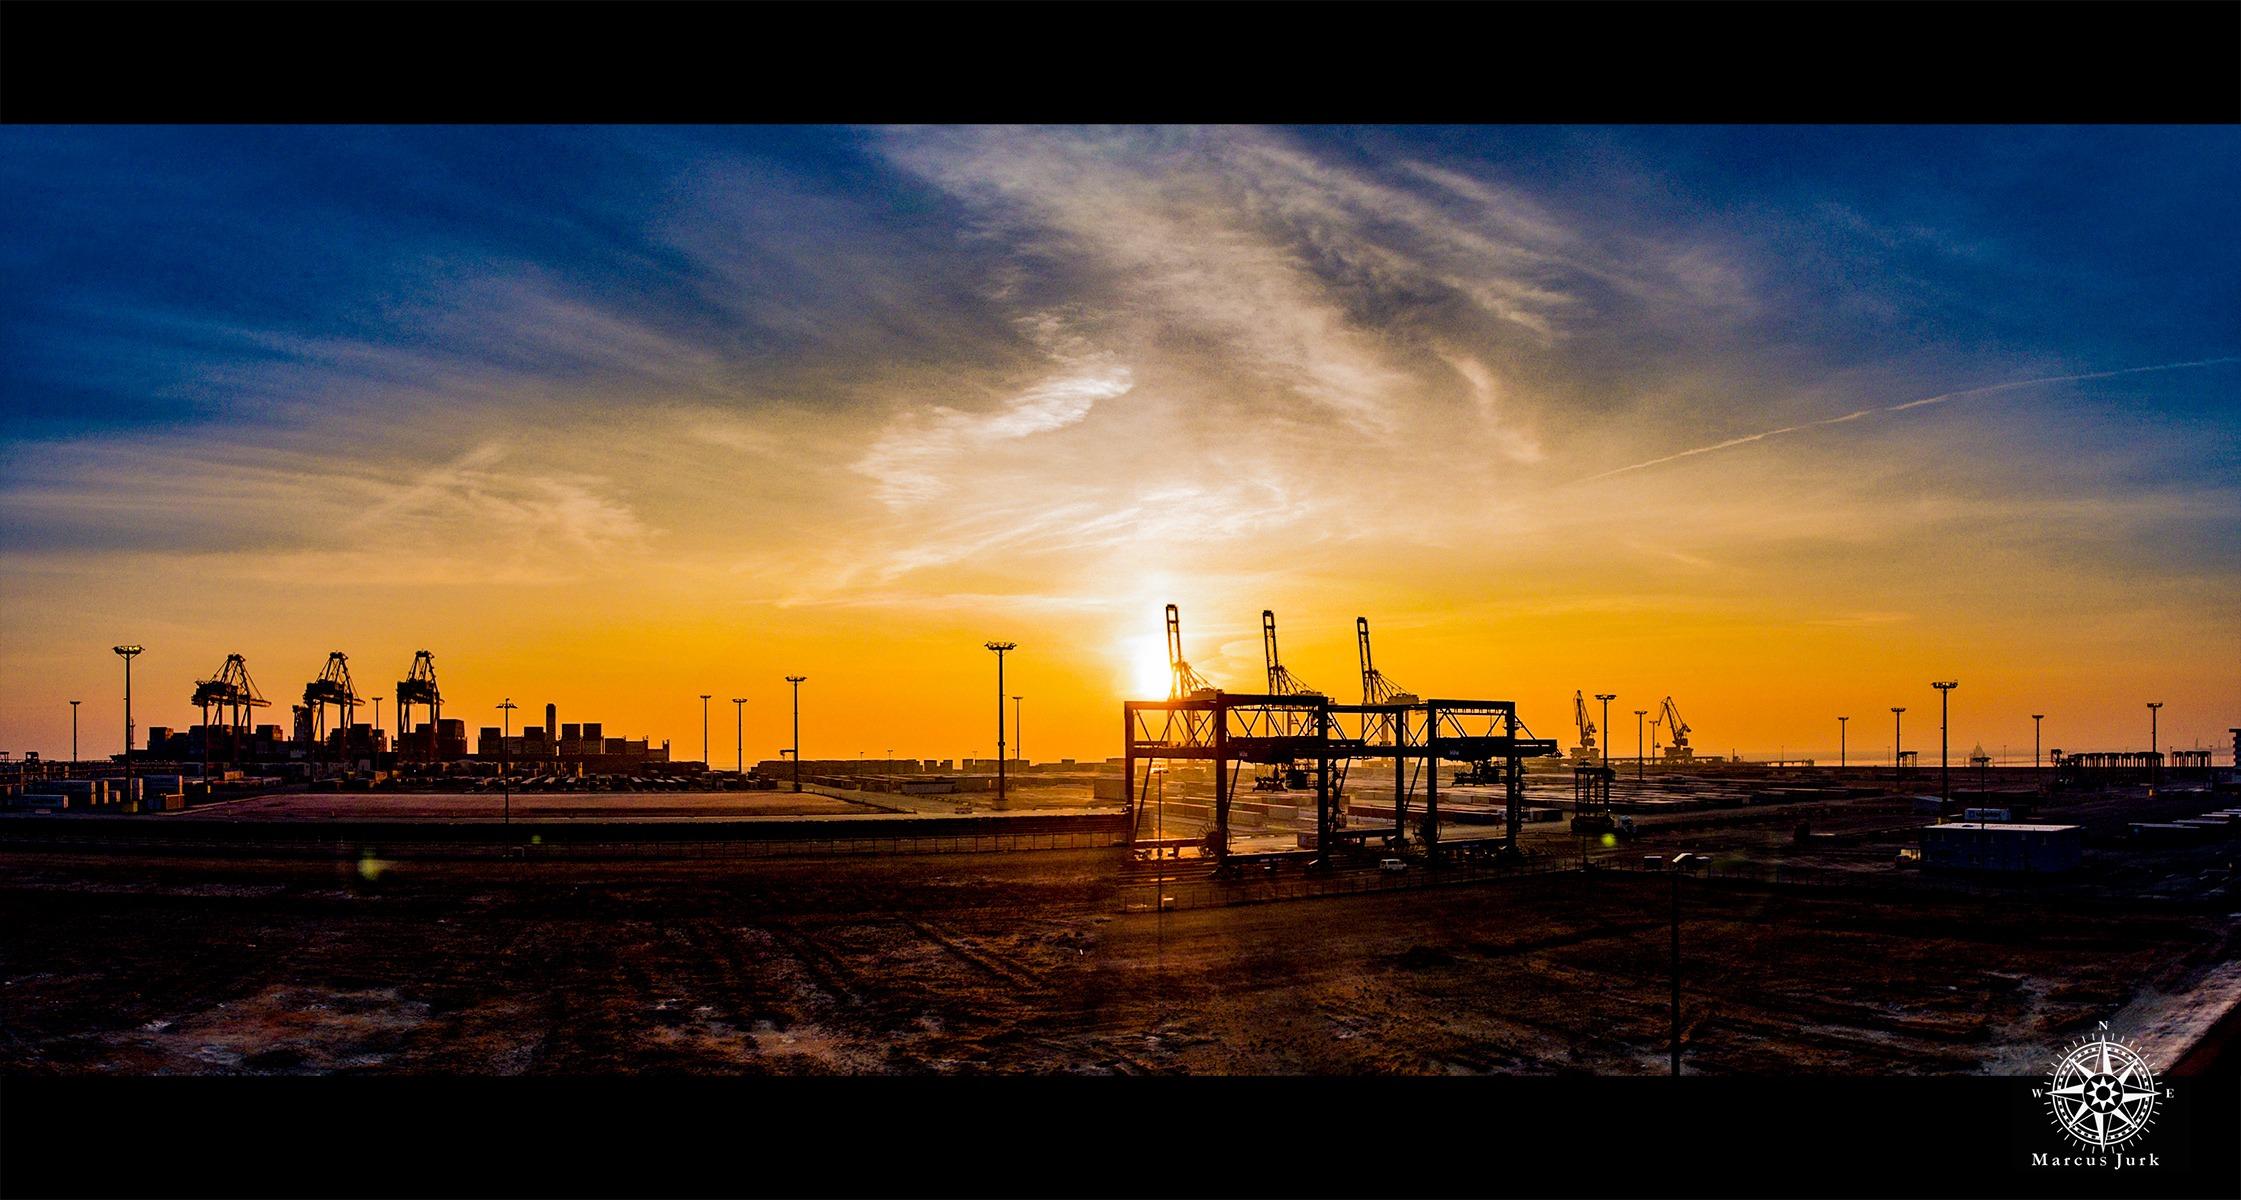 dji-nordfrost-märz-2018-Unbenanntes_Panorama1